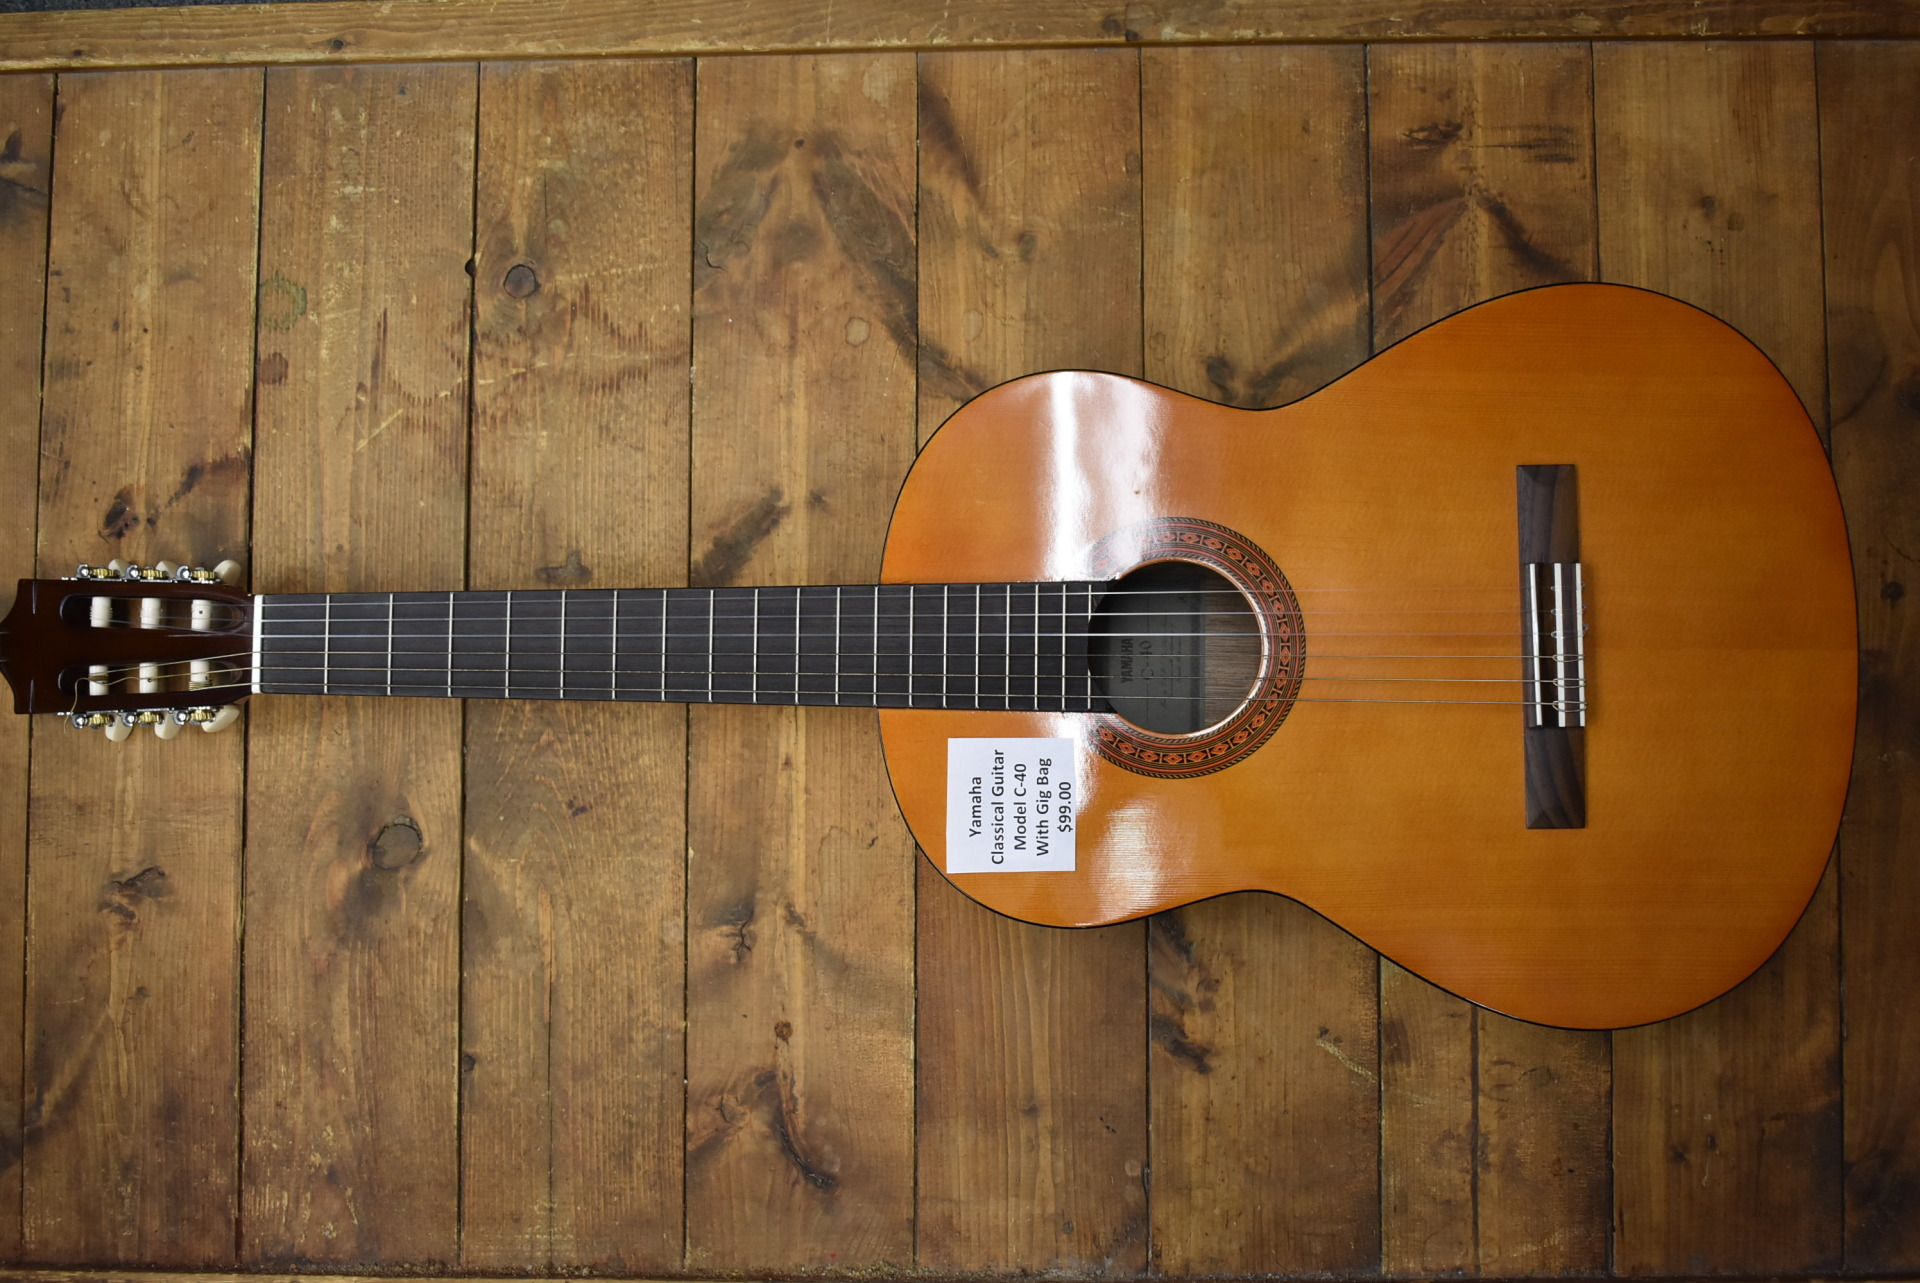 Yamaha Model C-40